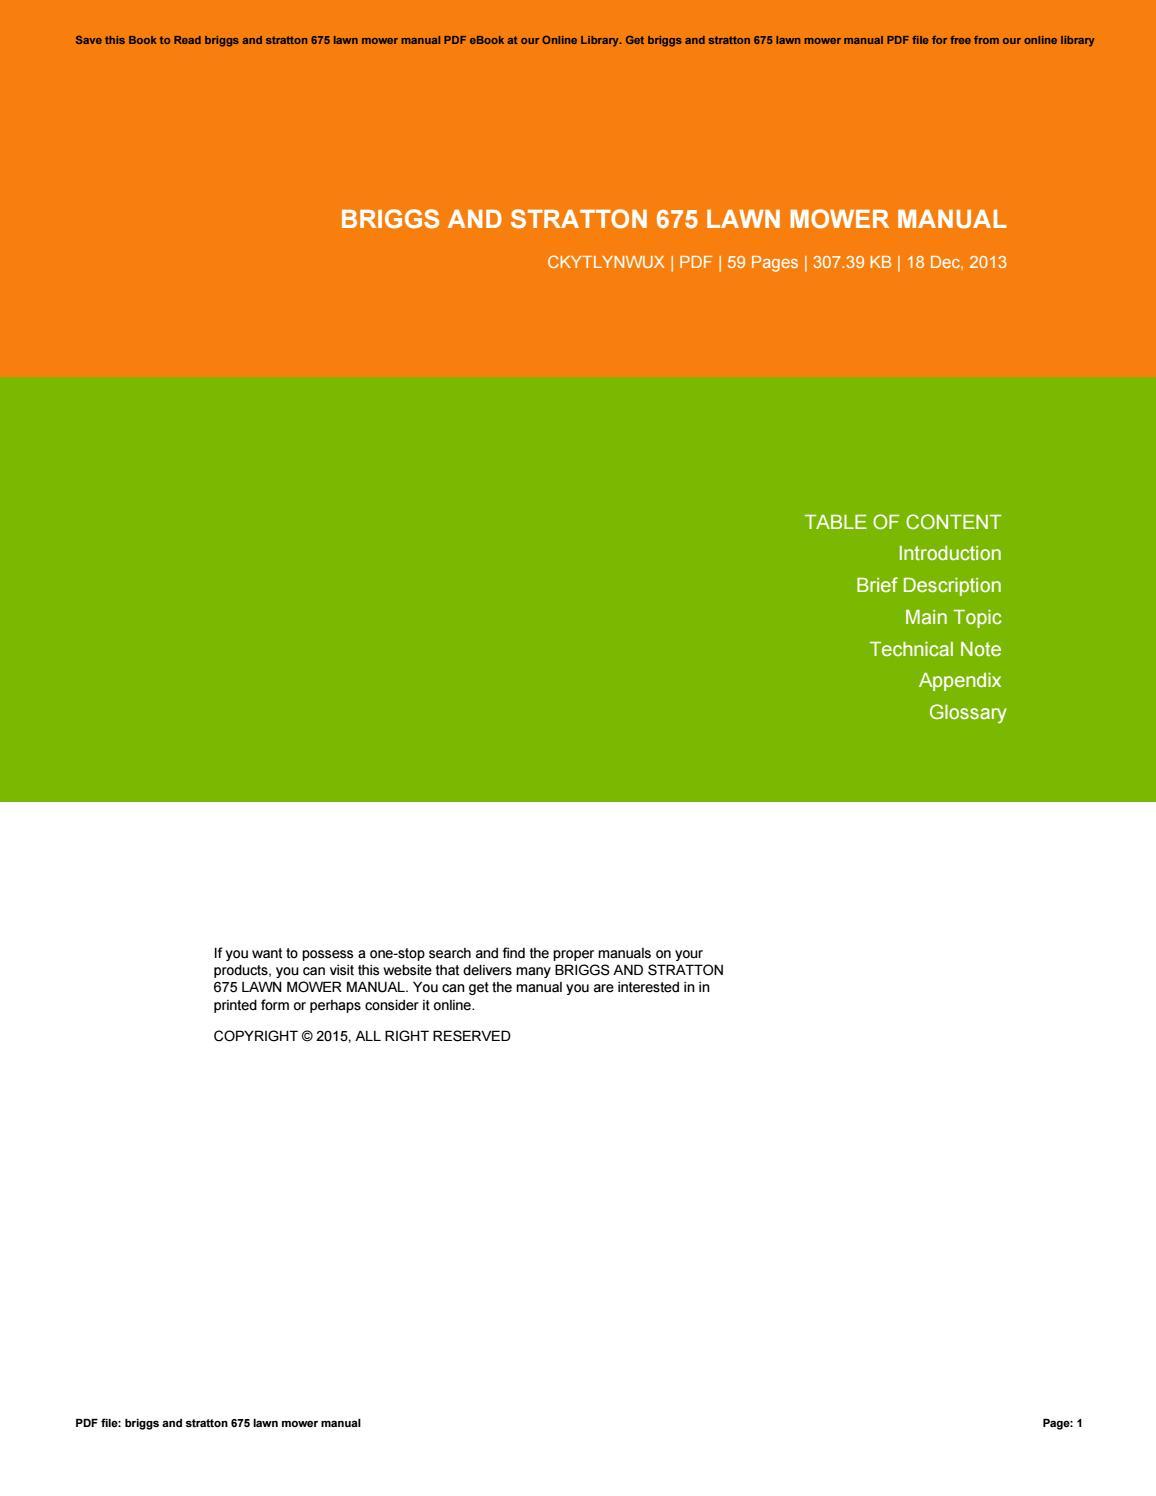 Briggs and stratton manuals 675 series ebook manual briggs and stratton carburetor array briggs and stratton manuals 675 series ebook rh briggs and stratton manuals 675 series fandeluxe Image collections